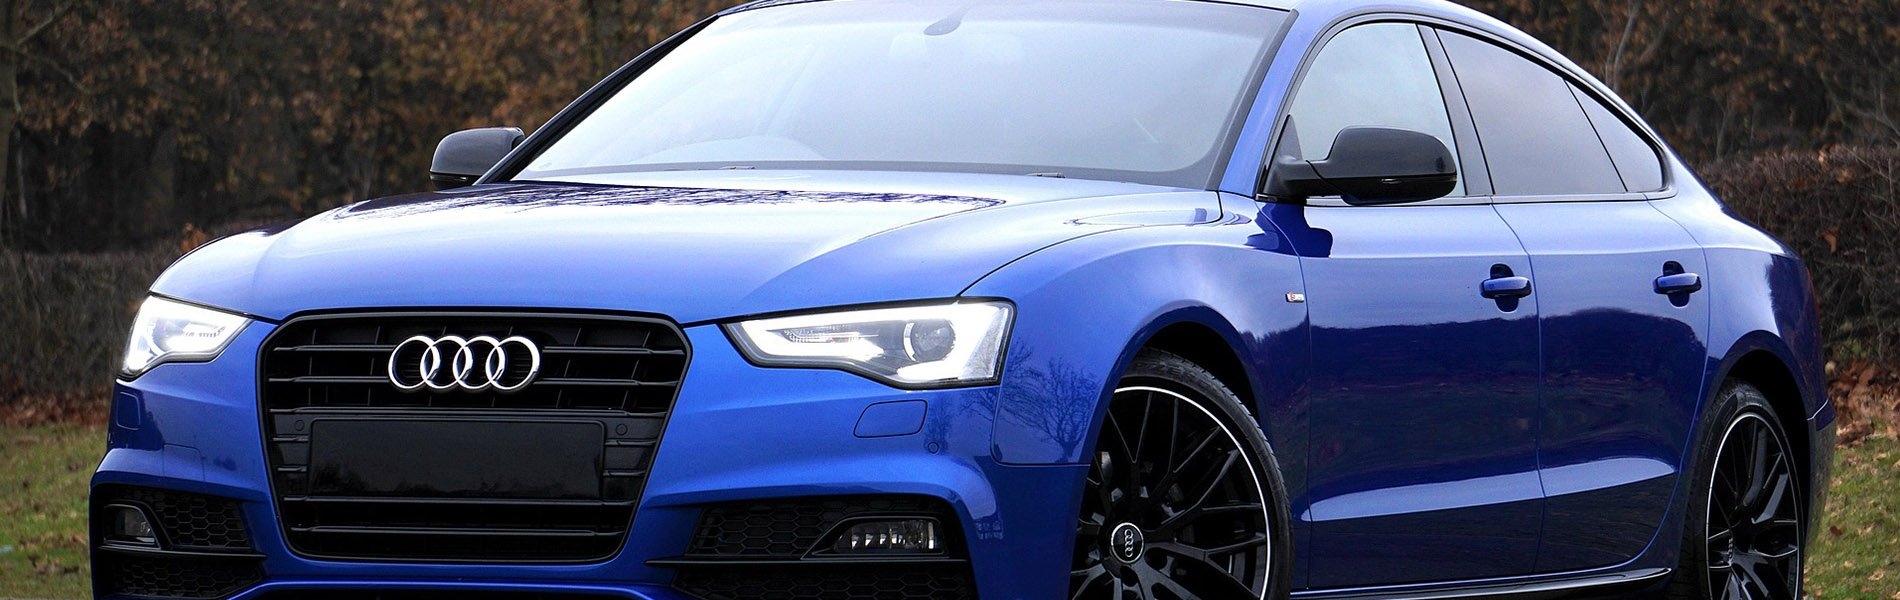 Audi Servicing & Specialist Teesside